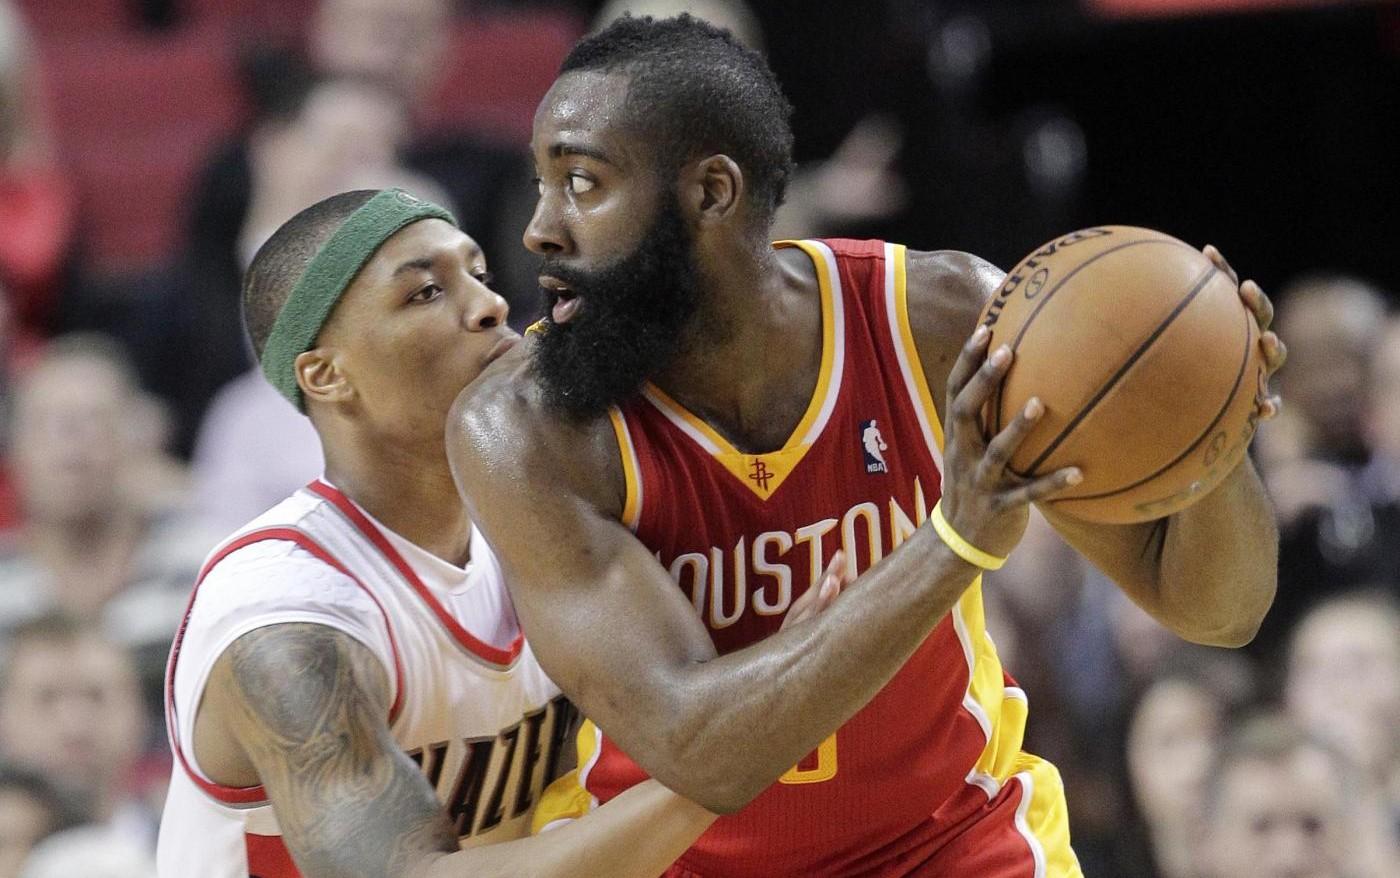 Nba pronostici 18 novembre, Rockets-Kings